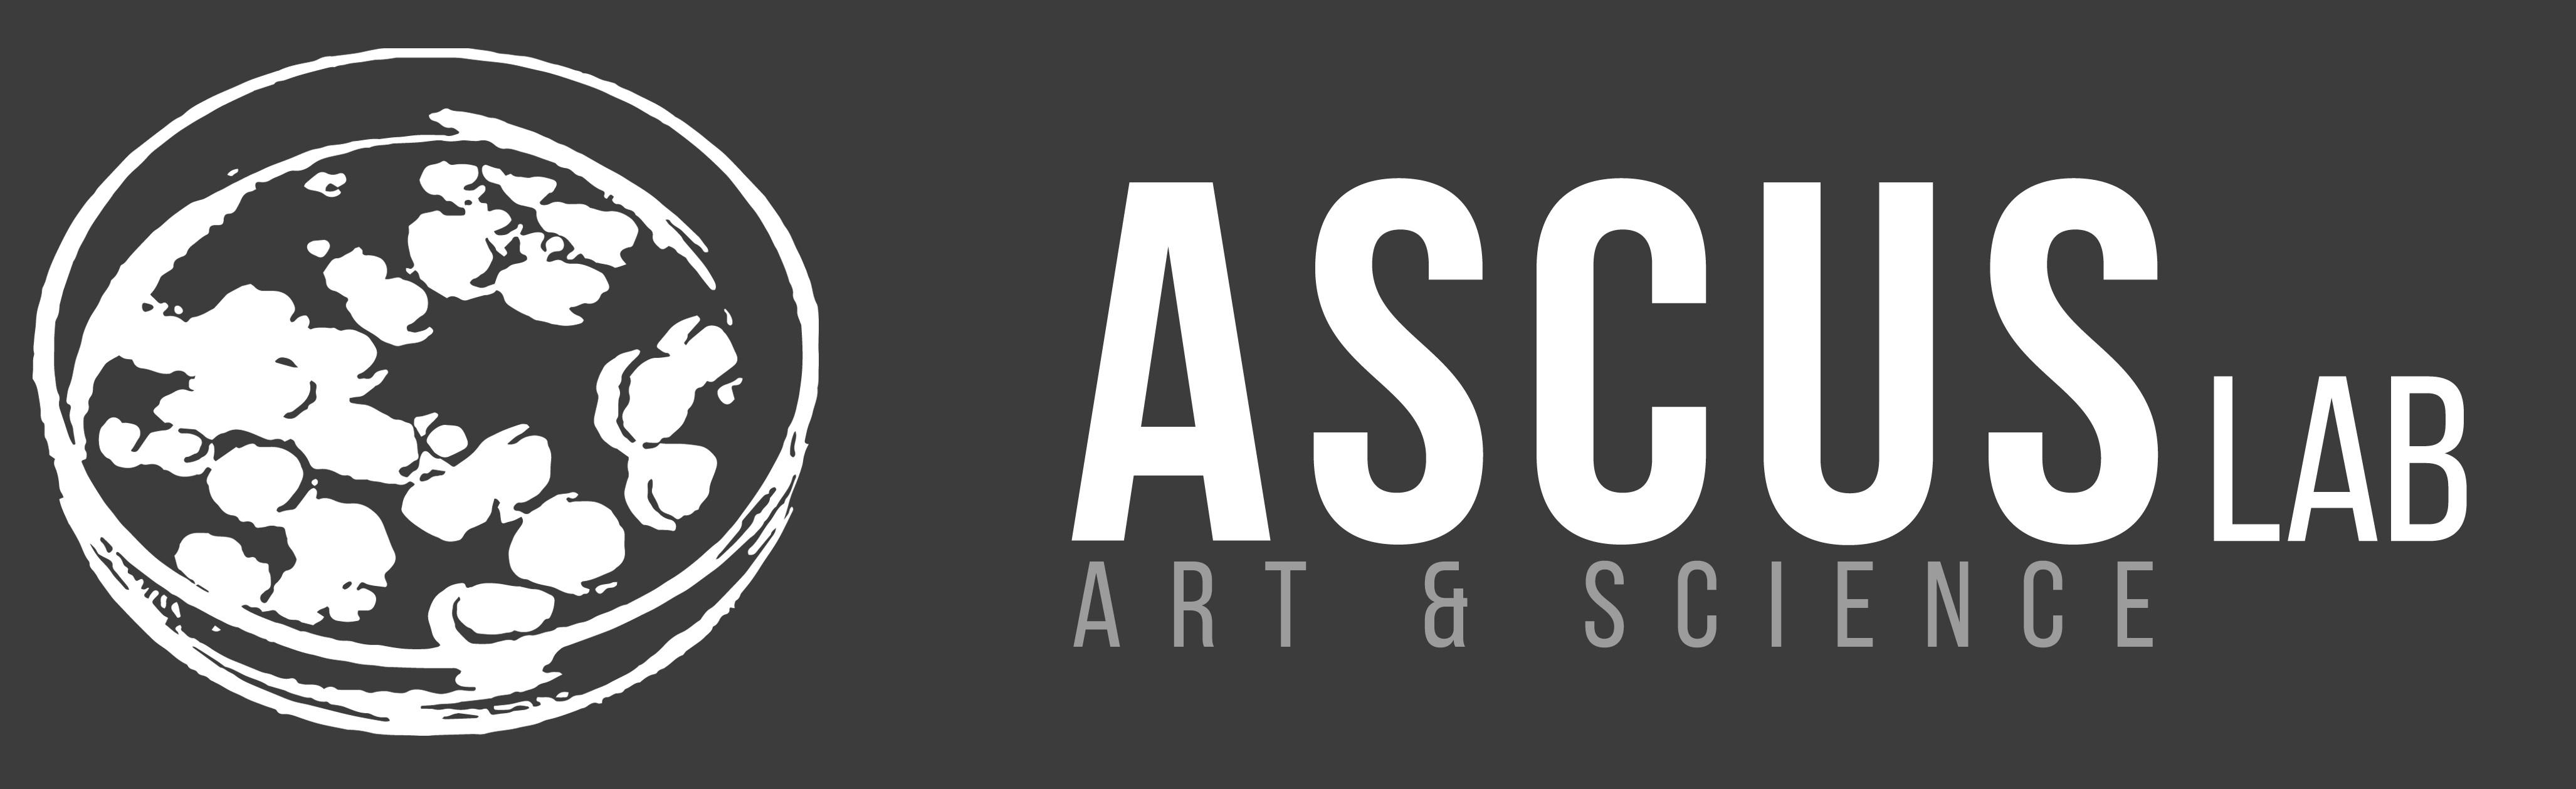 ASCUS Lab logo